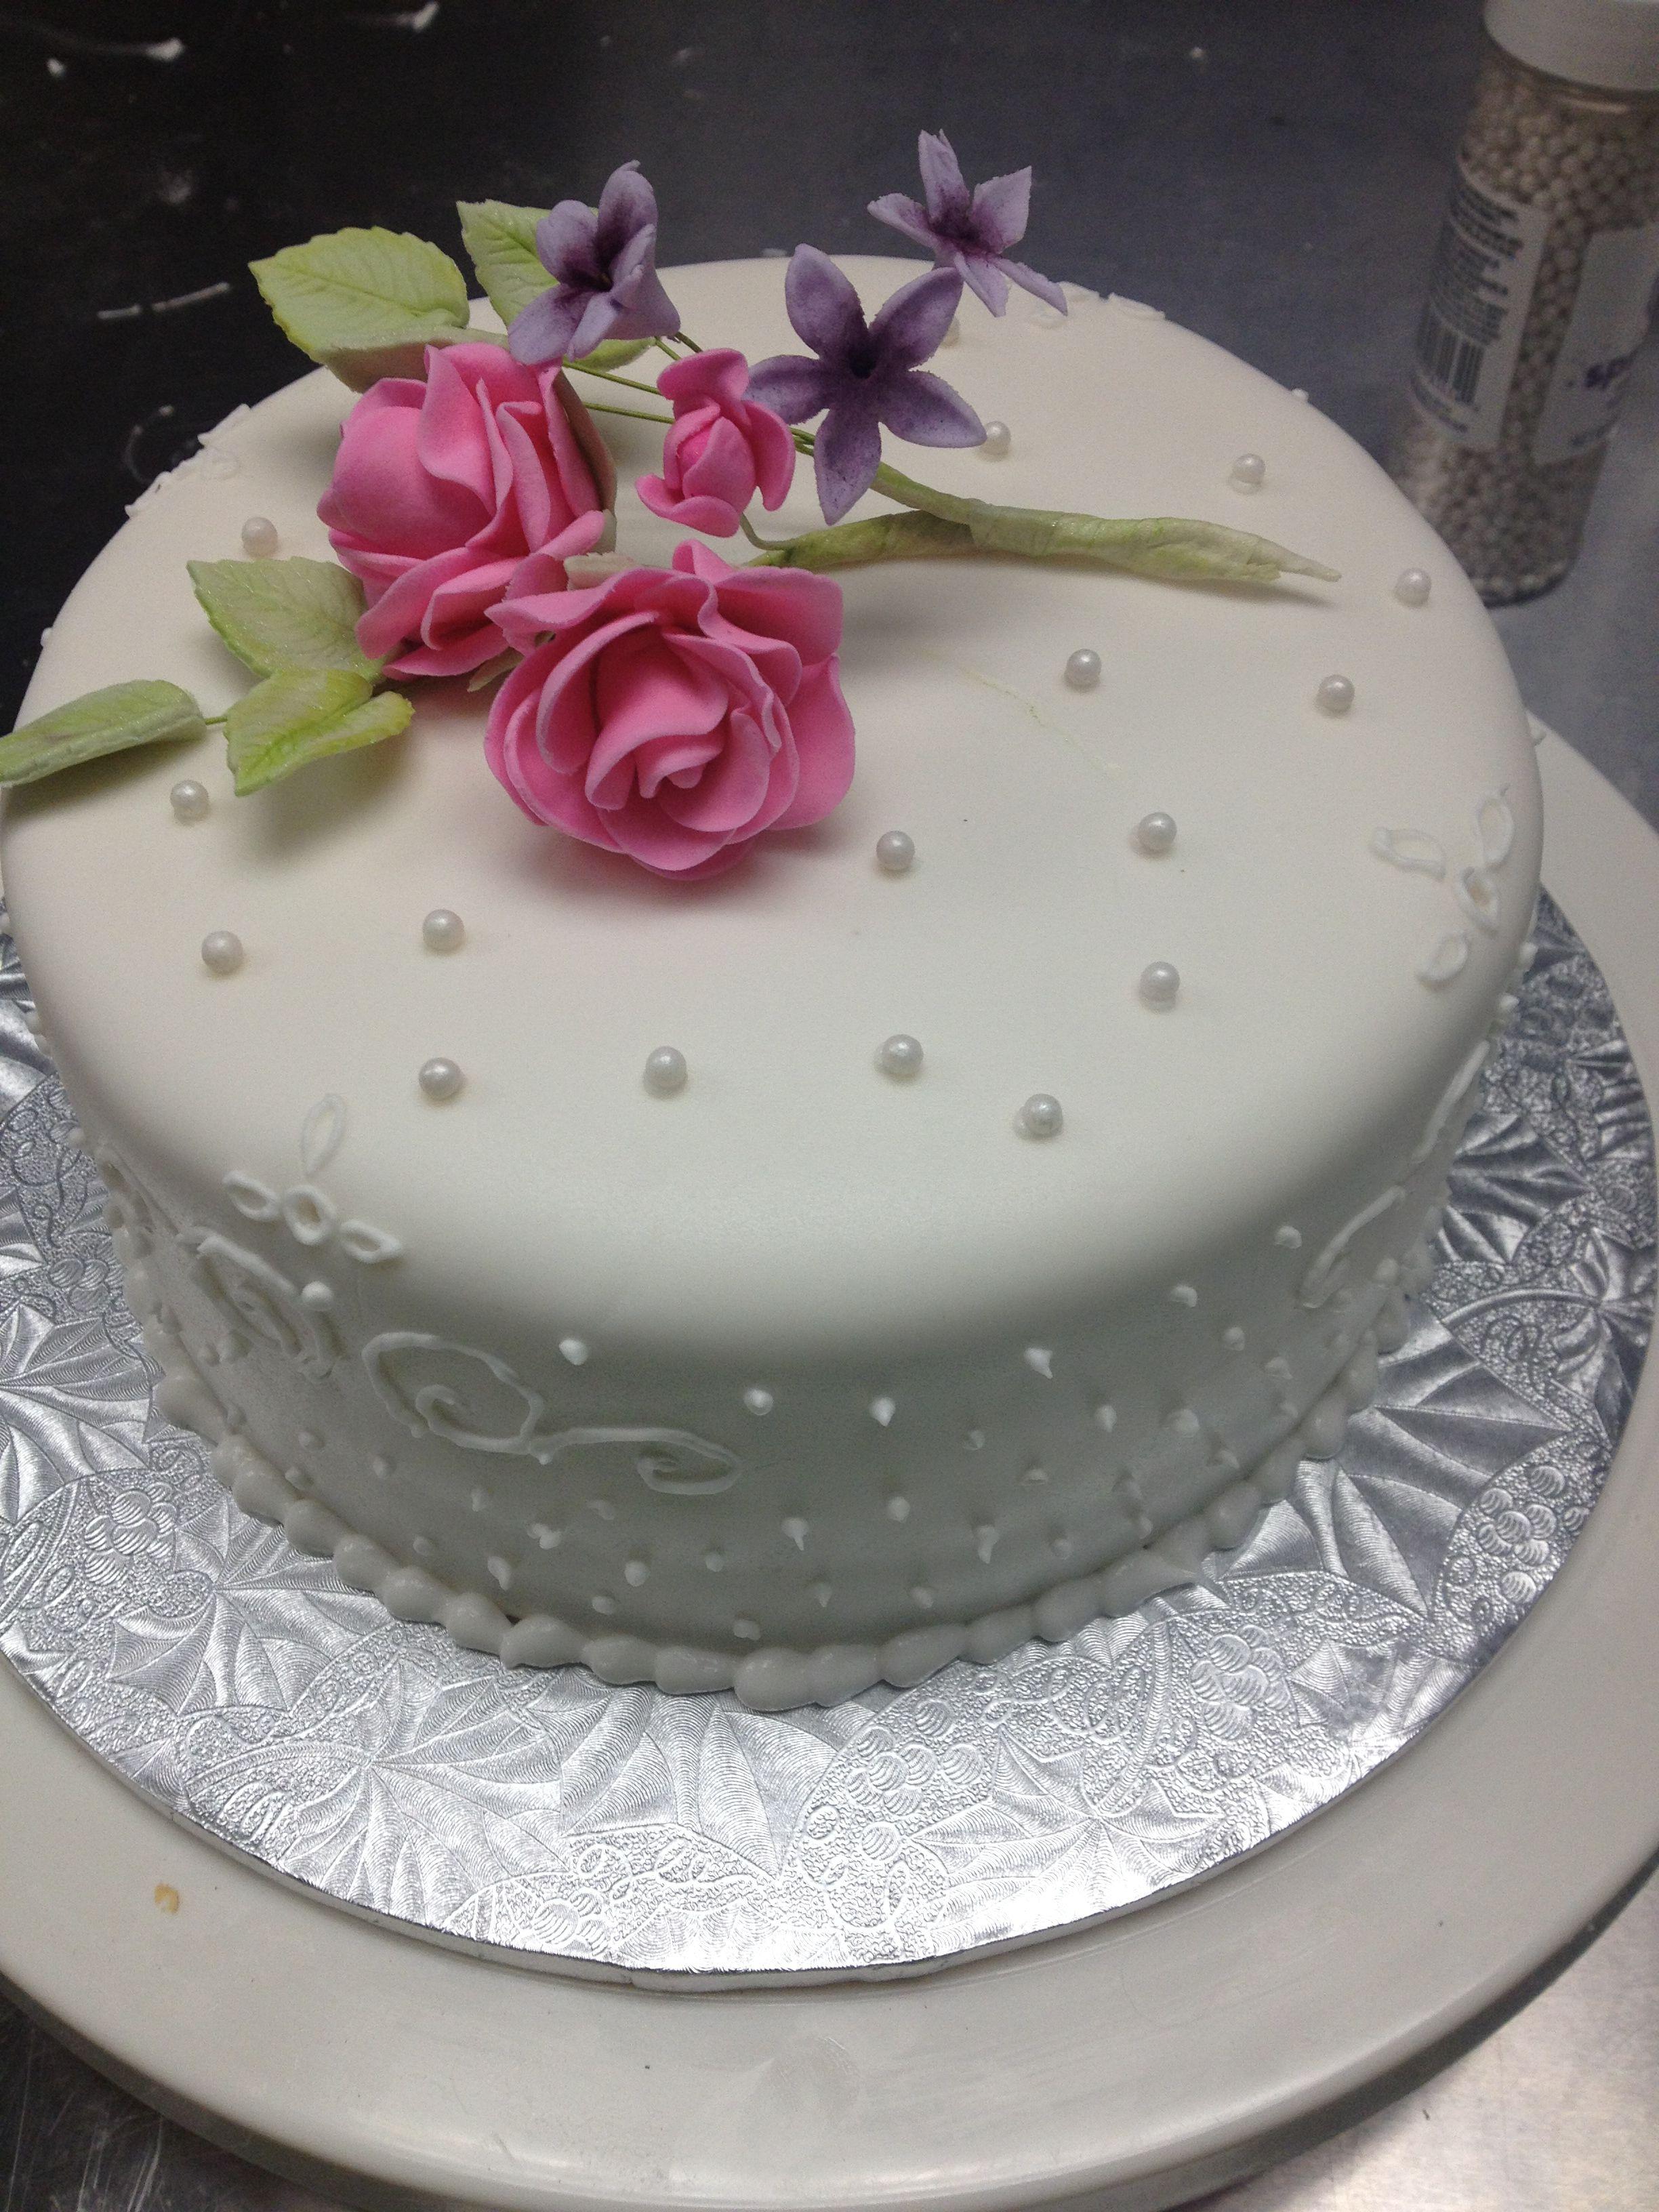 Simple but pretty cake